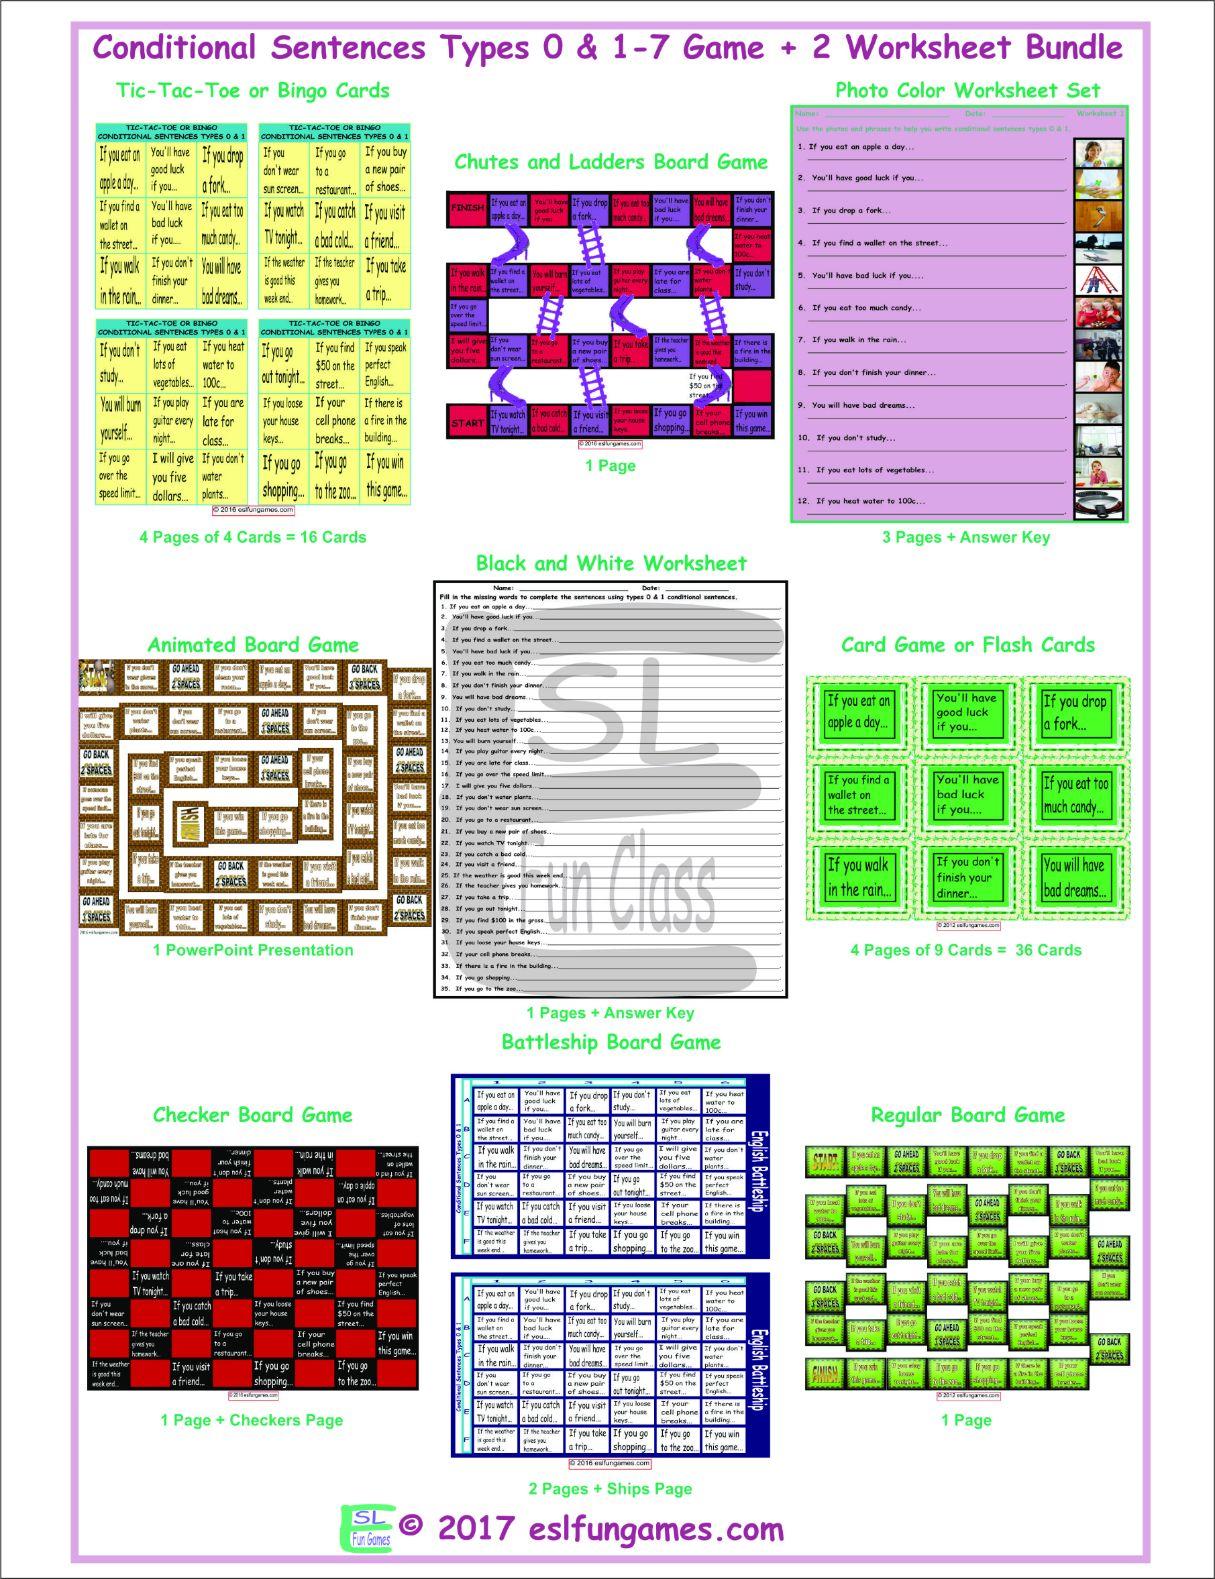 Conditional Sentences Types 0 Amp 1 7 Game Plus 2 Worksheet Bundle By Eslfungames